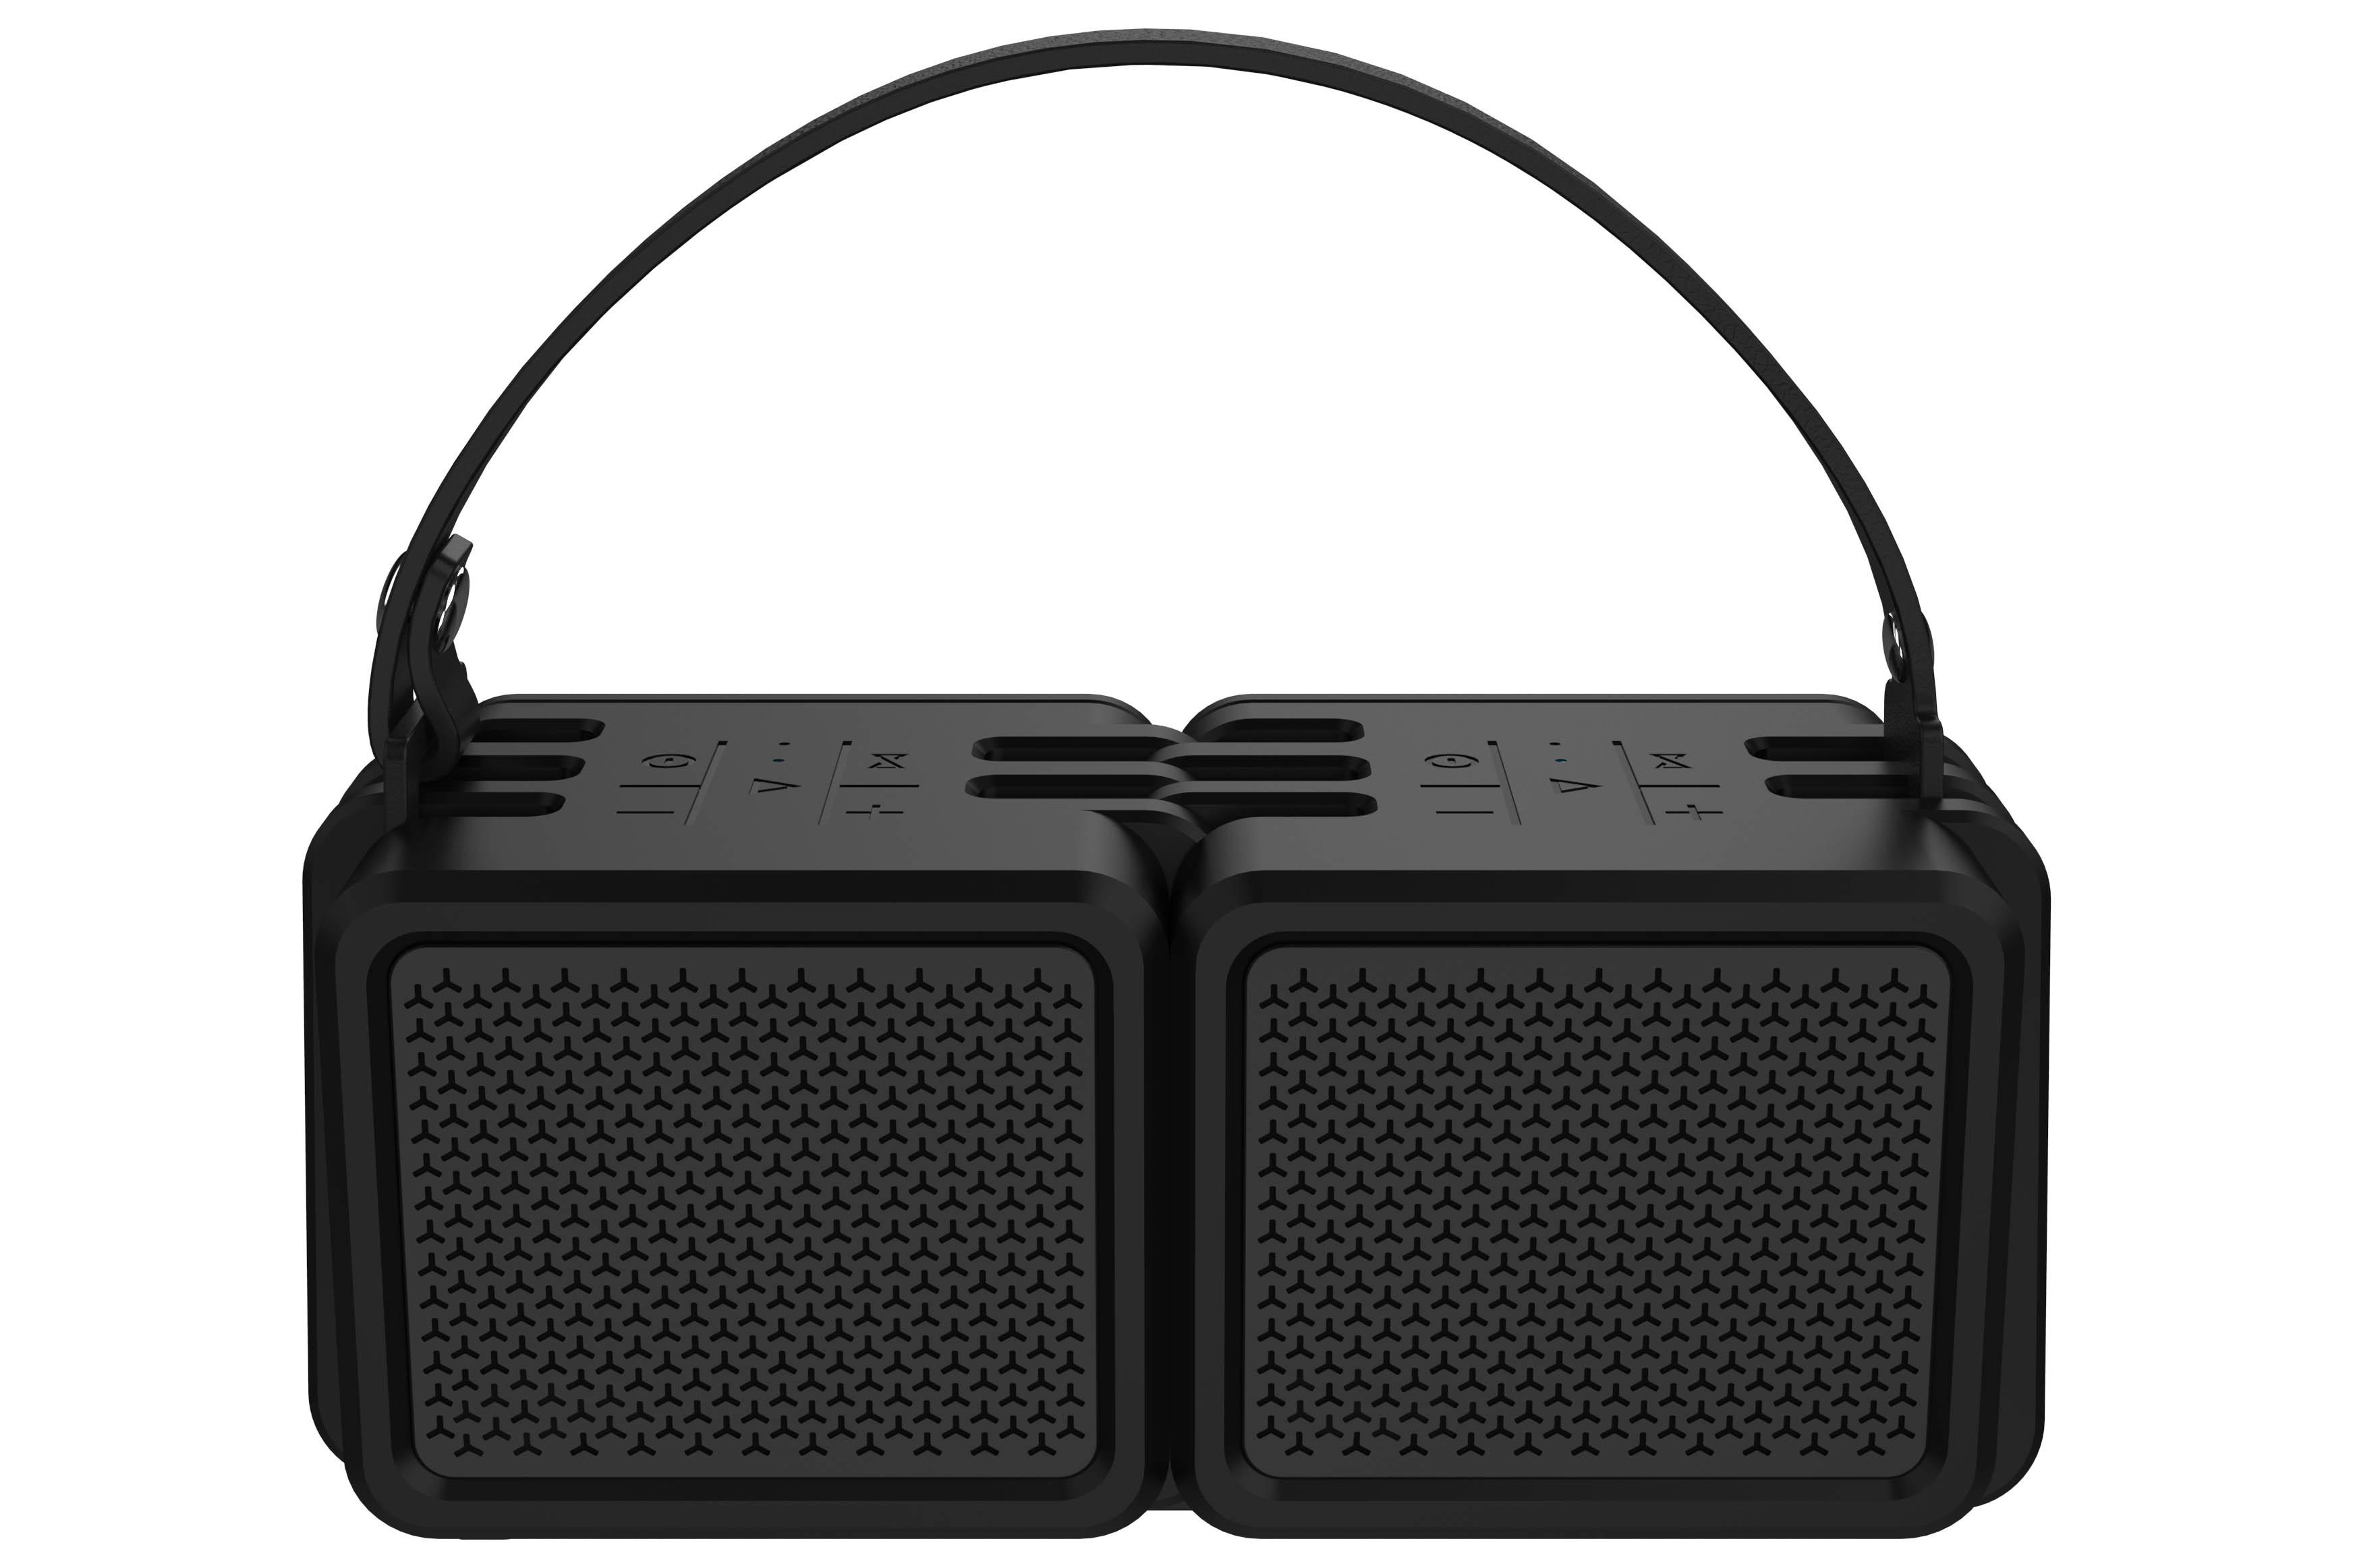 EVOLVEO Armor 2x1, outdoorový Bluetooth reproduktor, ARM-2x1